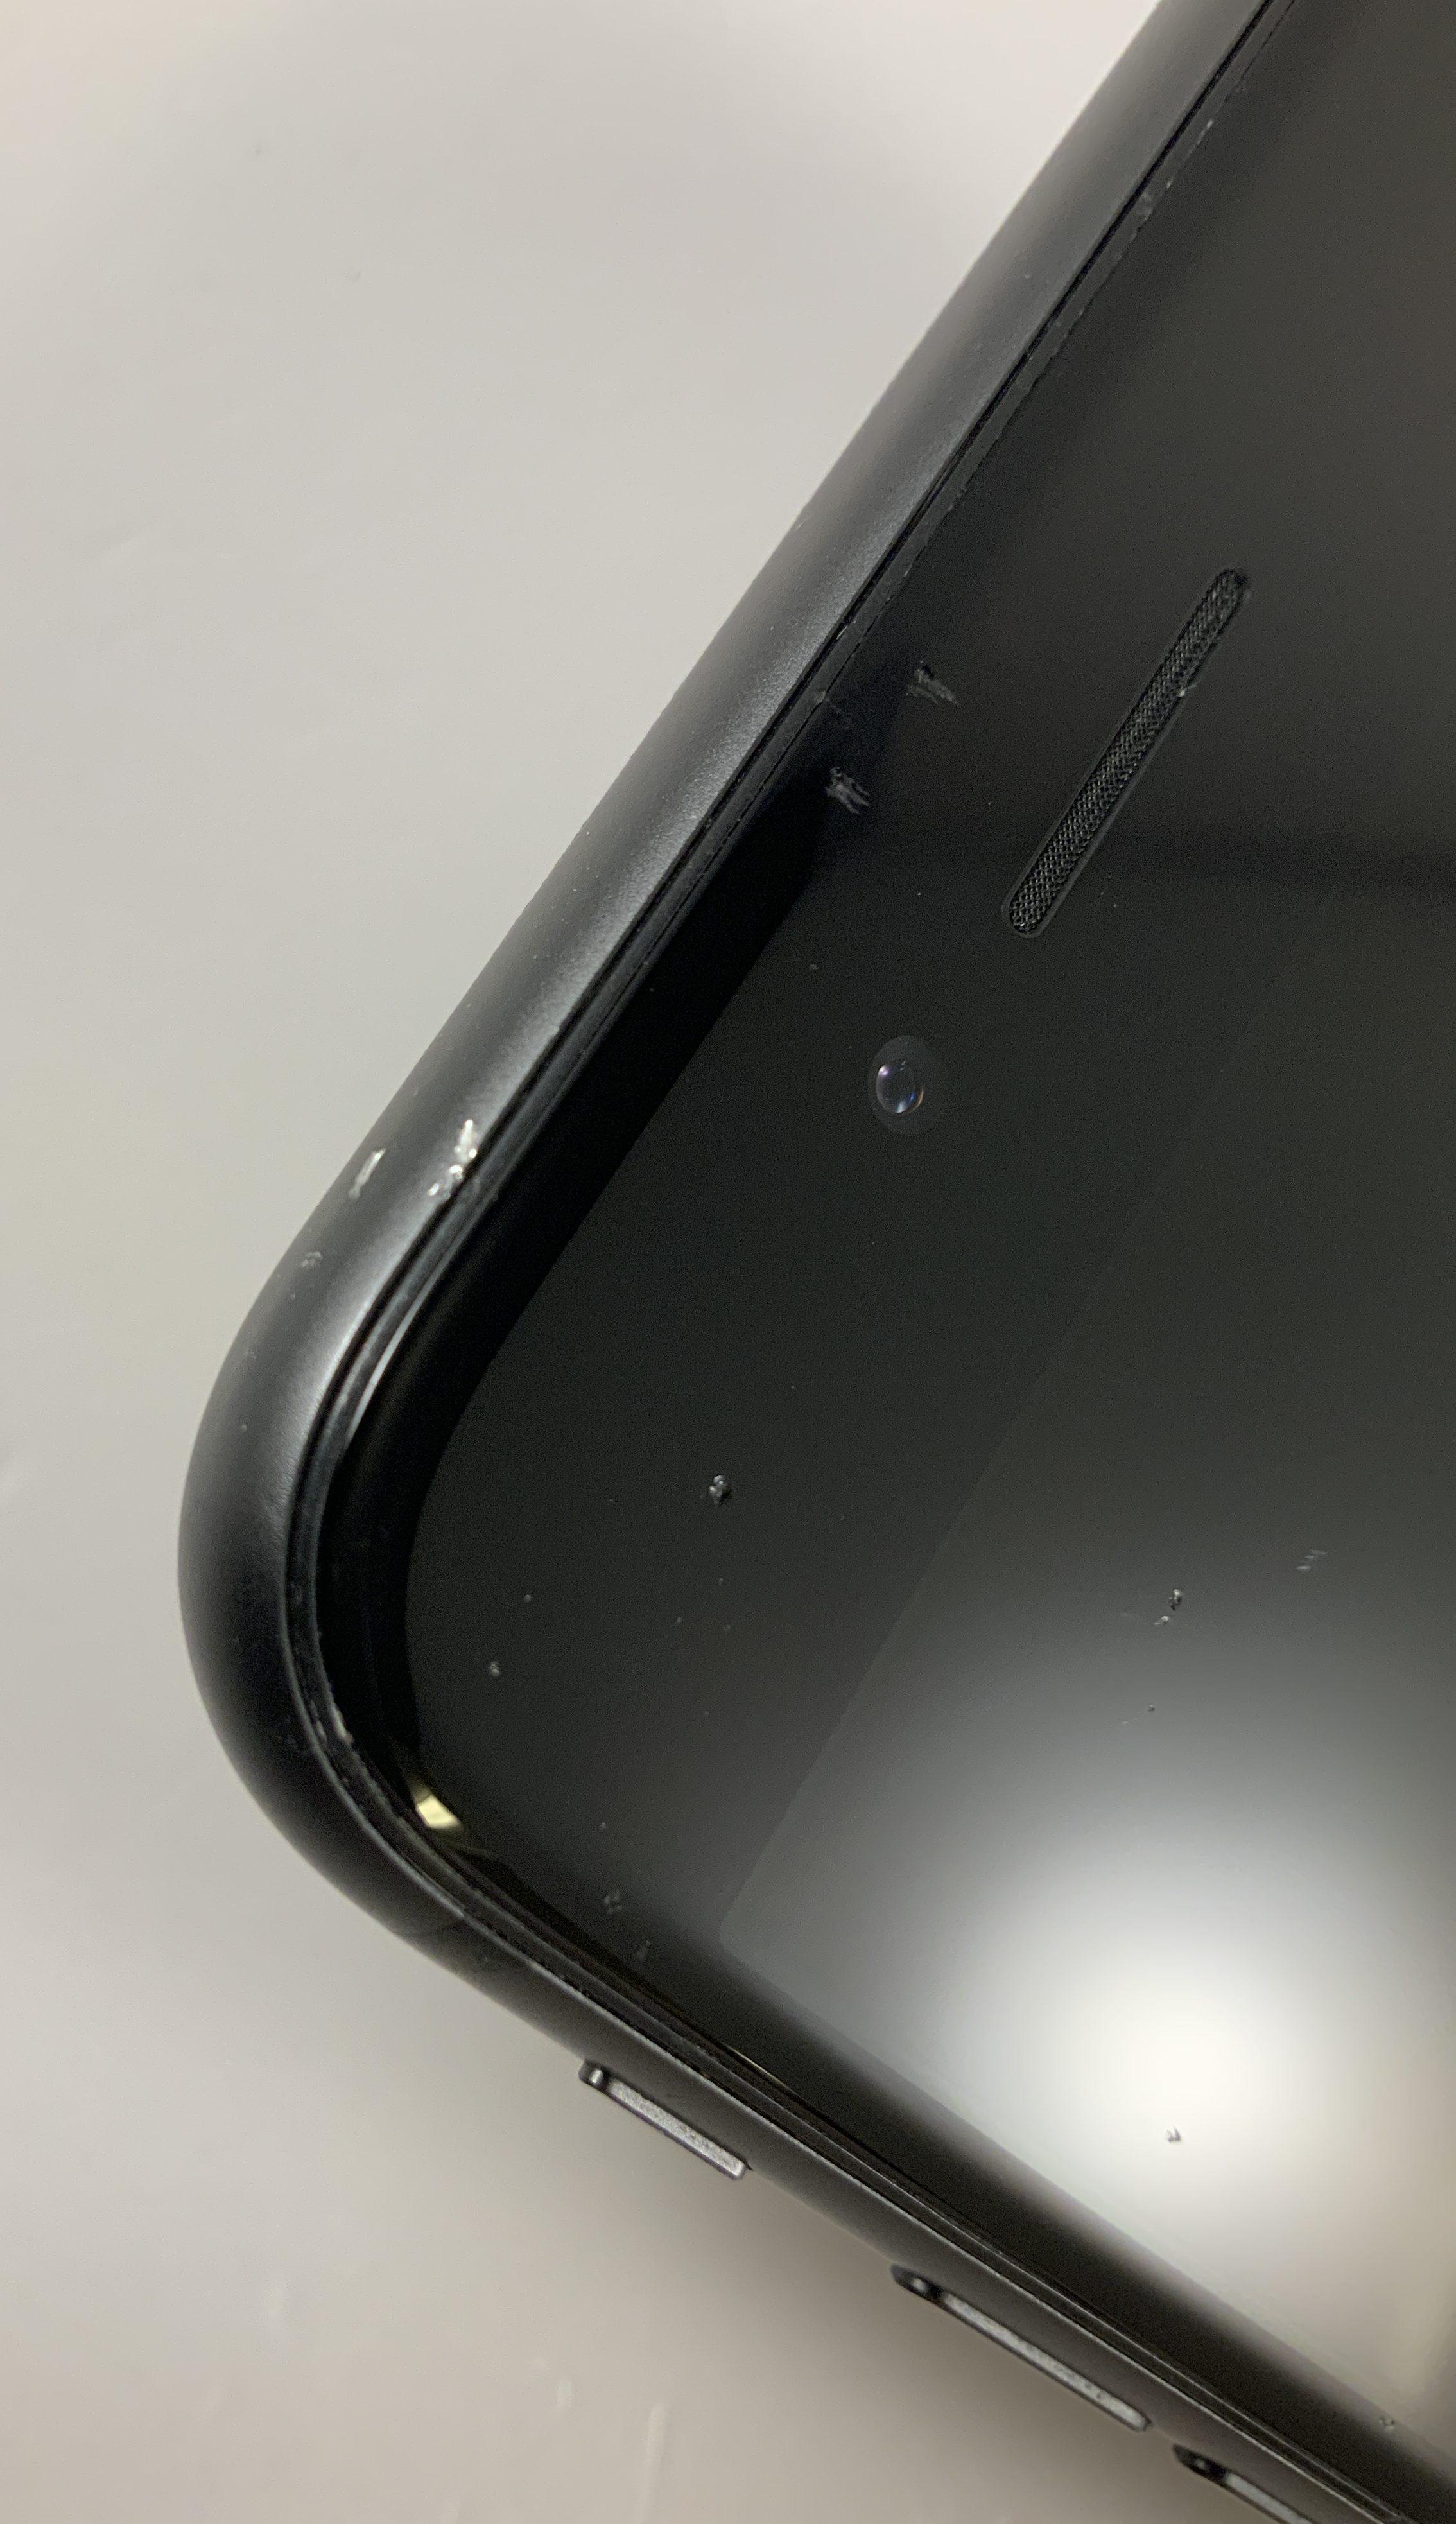 iPhone 8 64GB, 64GB, Space Gray, immagine 5